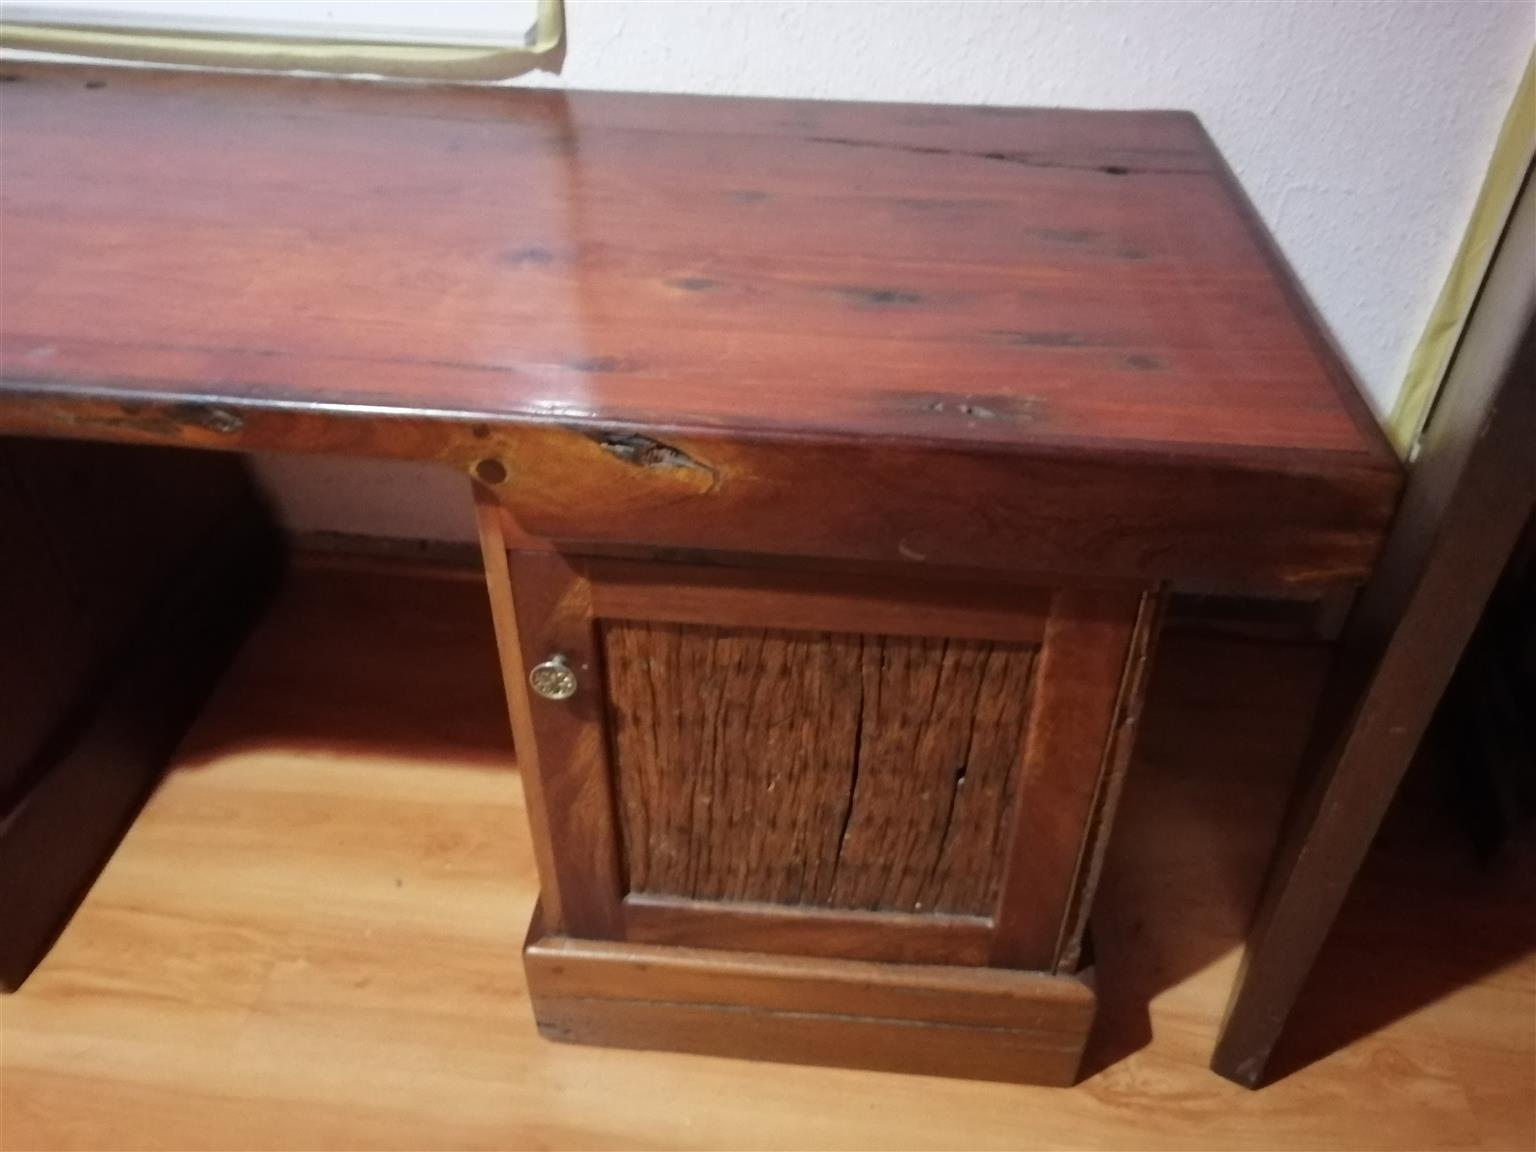 Sleeperwood desk for sale